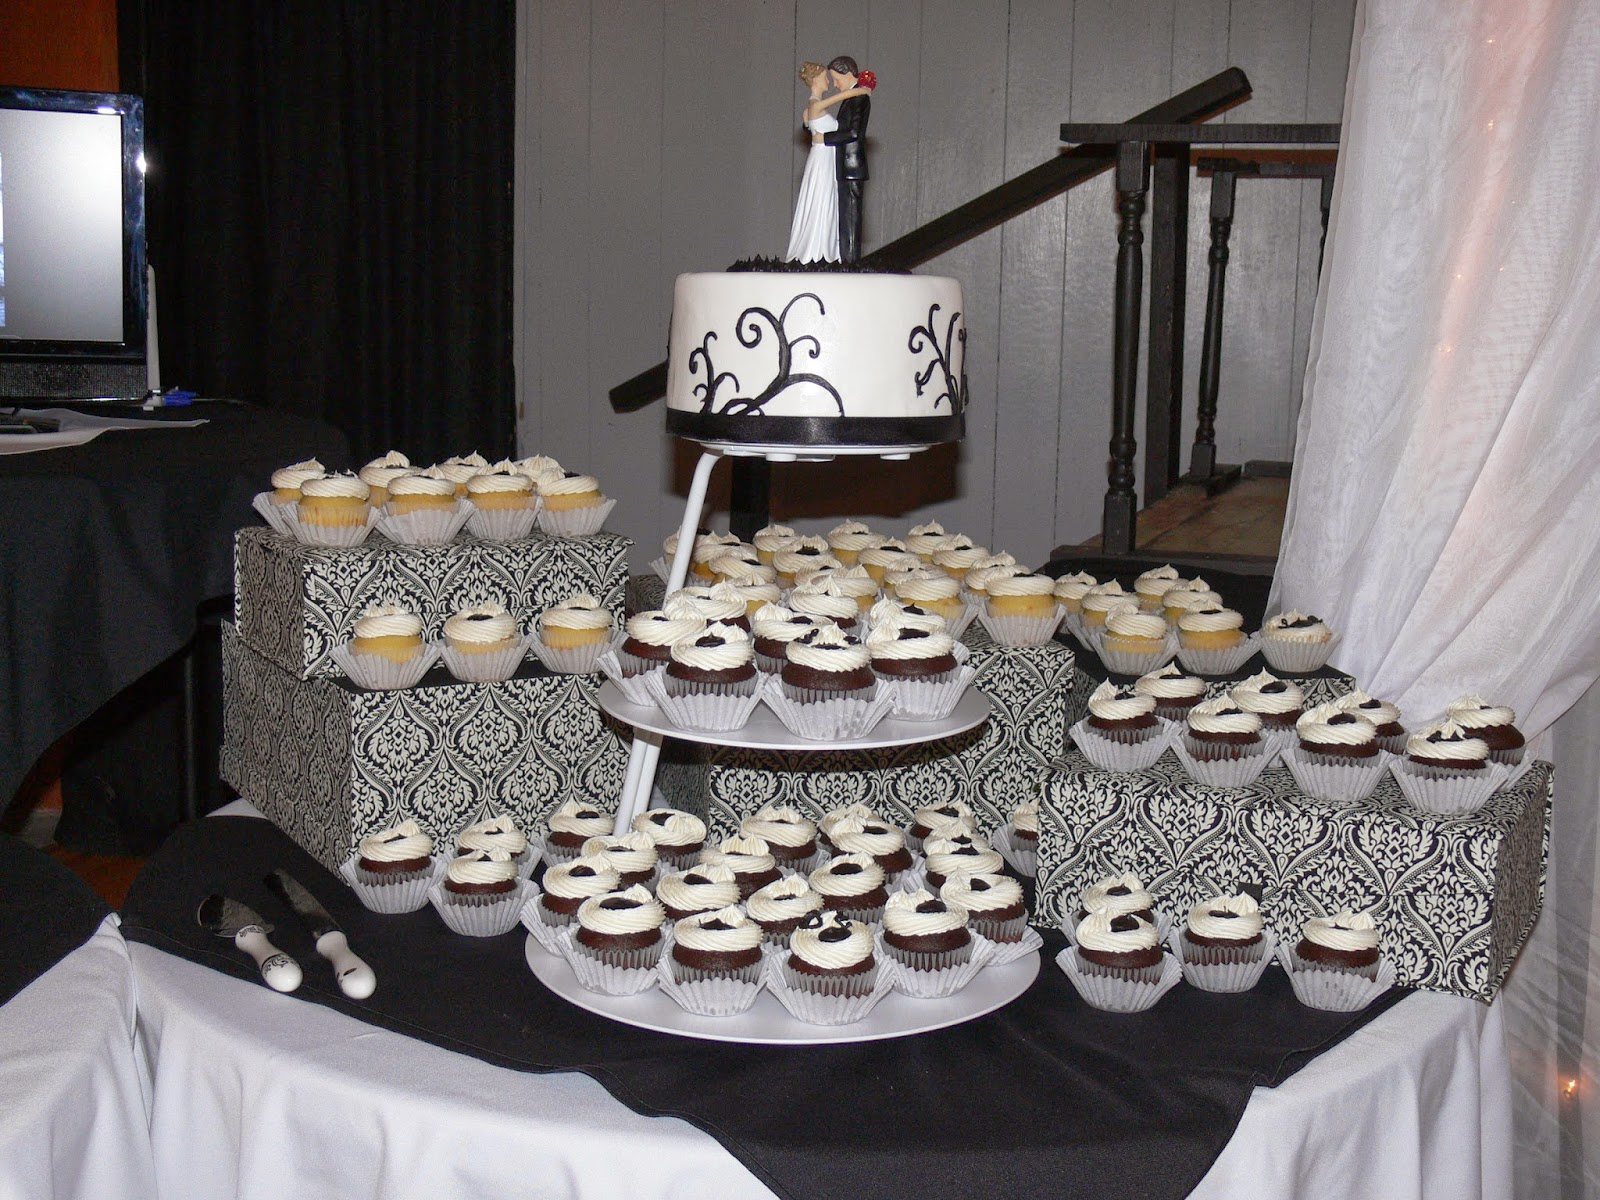 Ultimately Chocolate CAKES: Black-and-White Themed Wedding